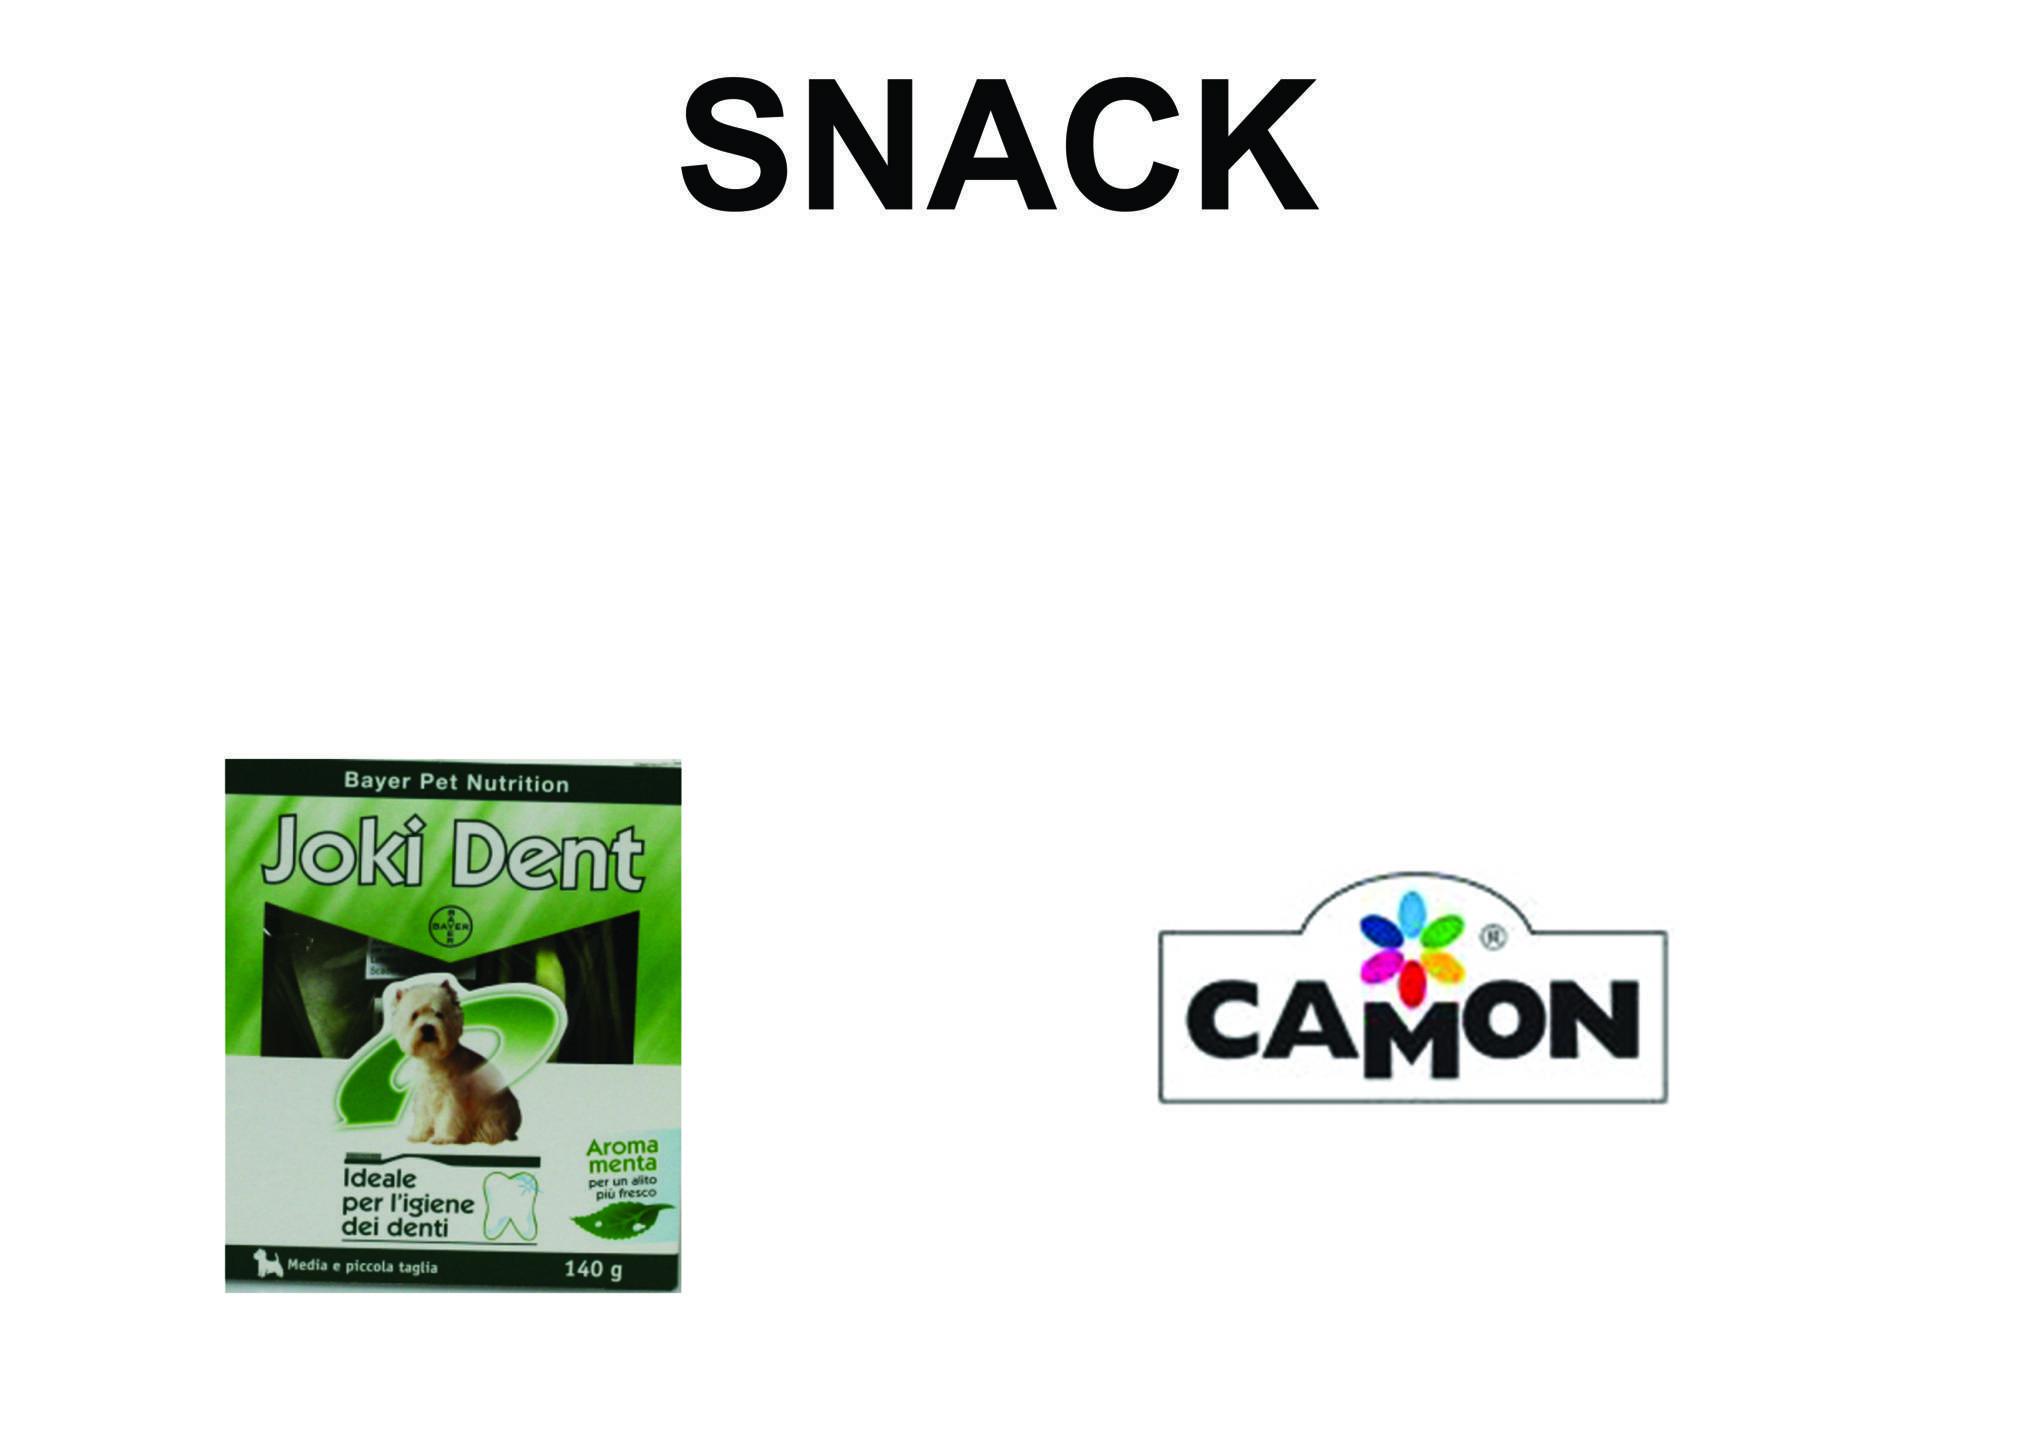 snack-file